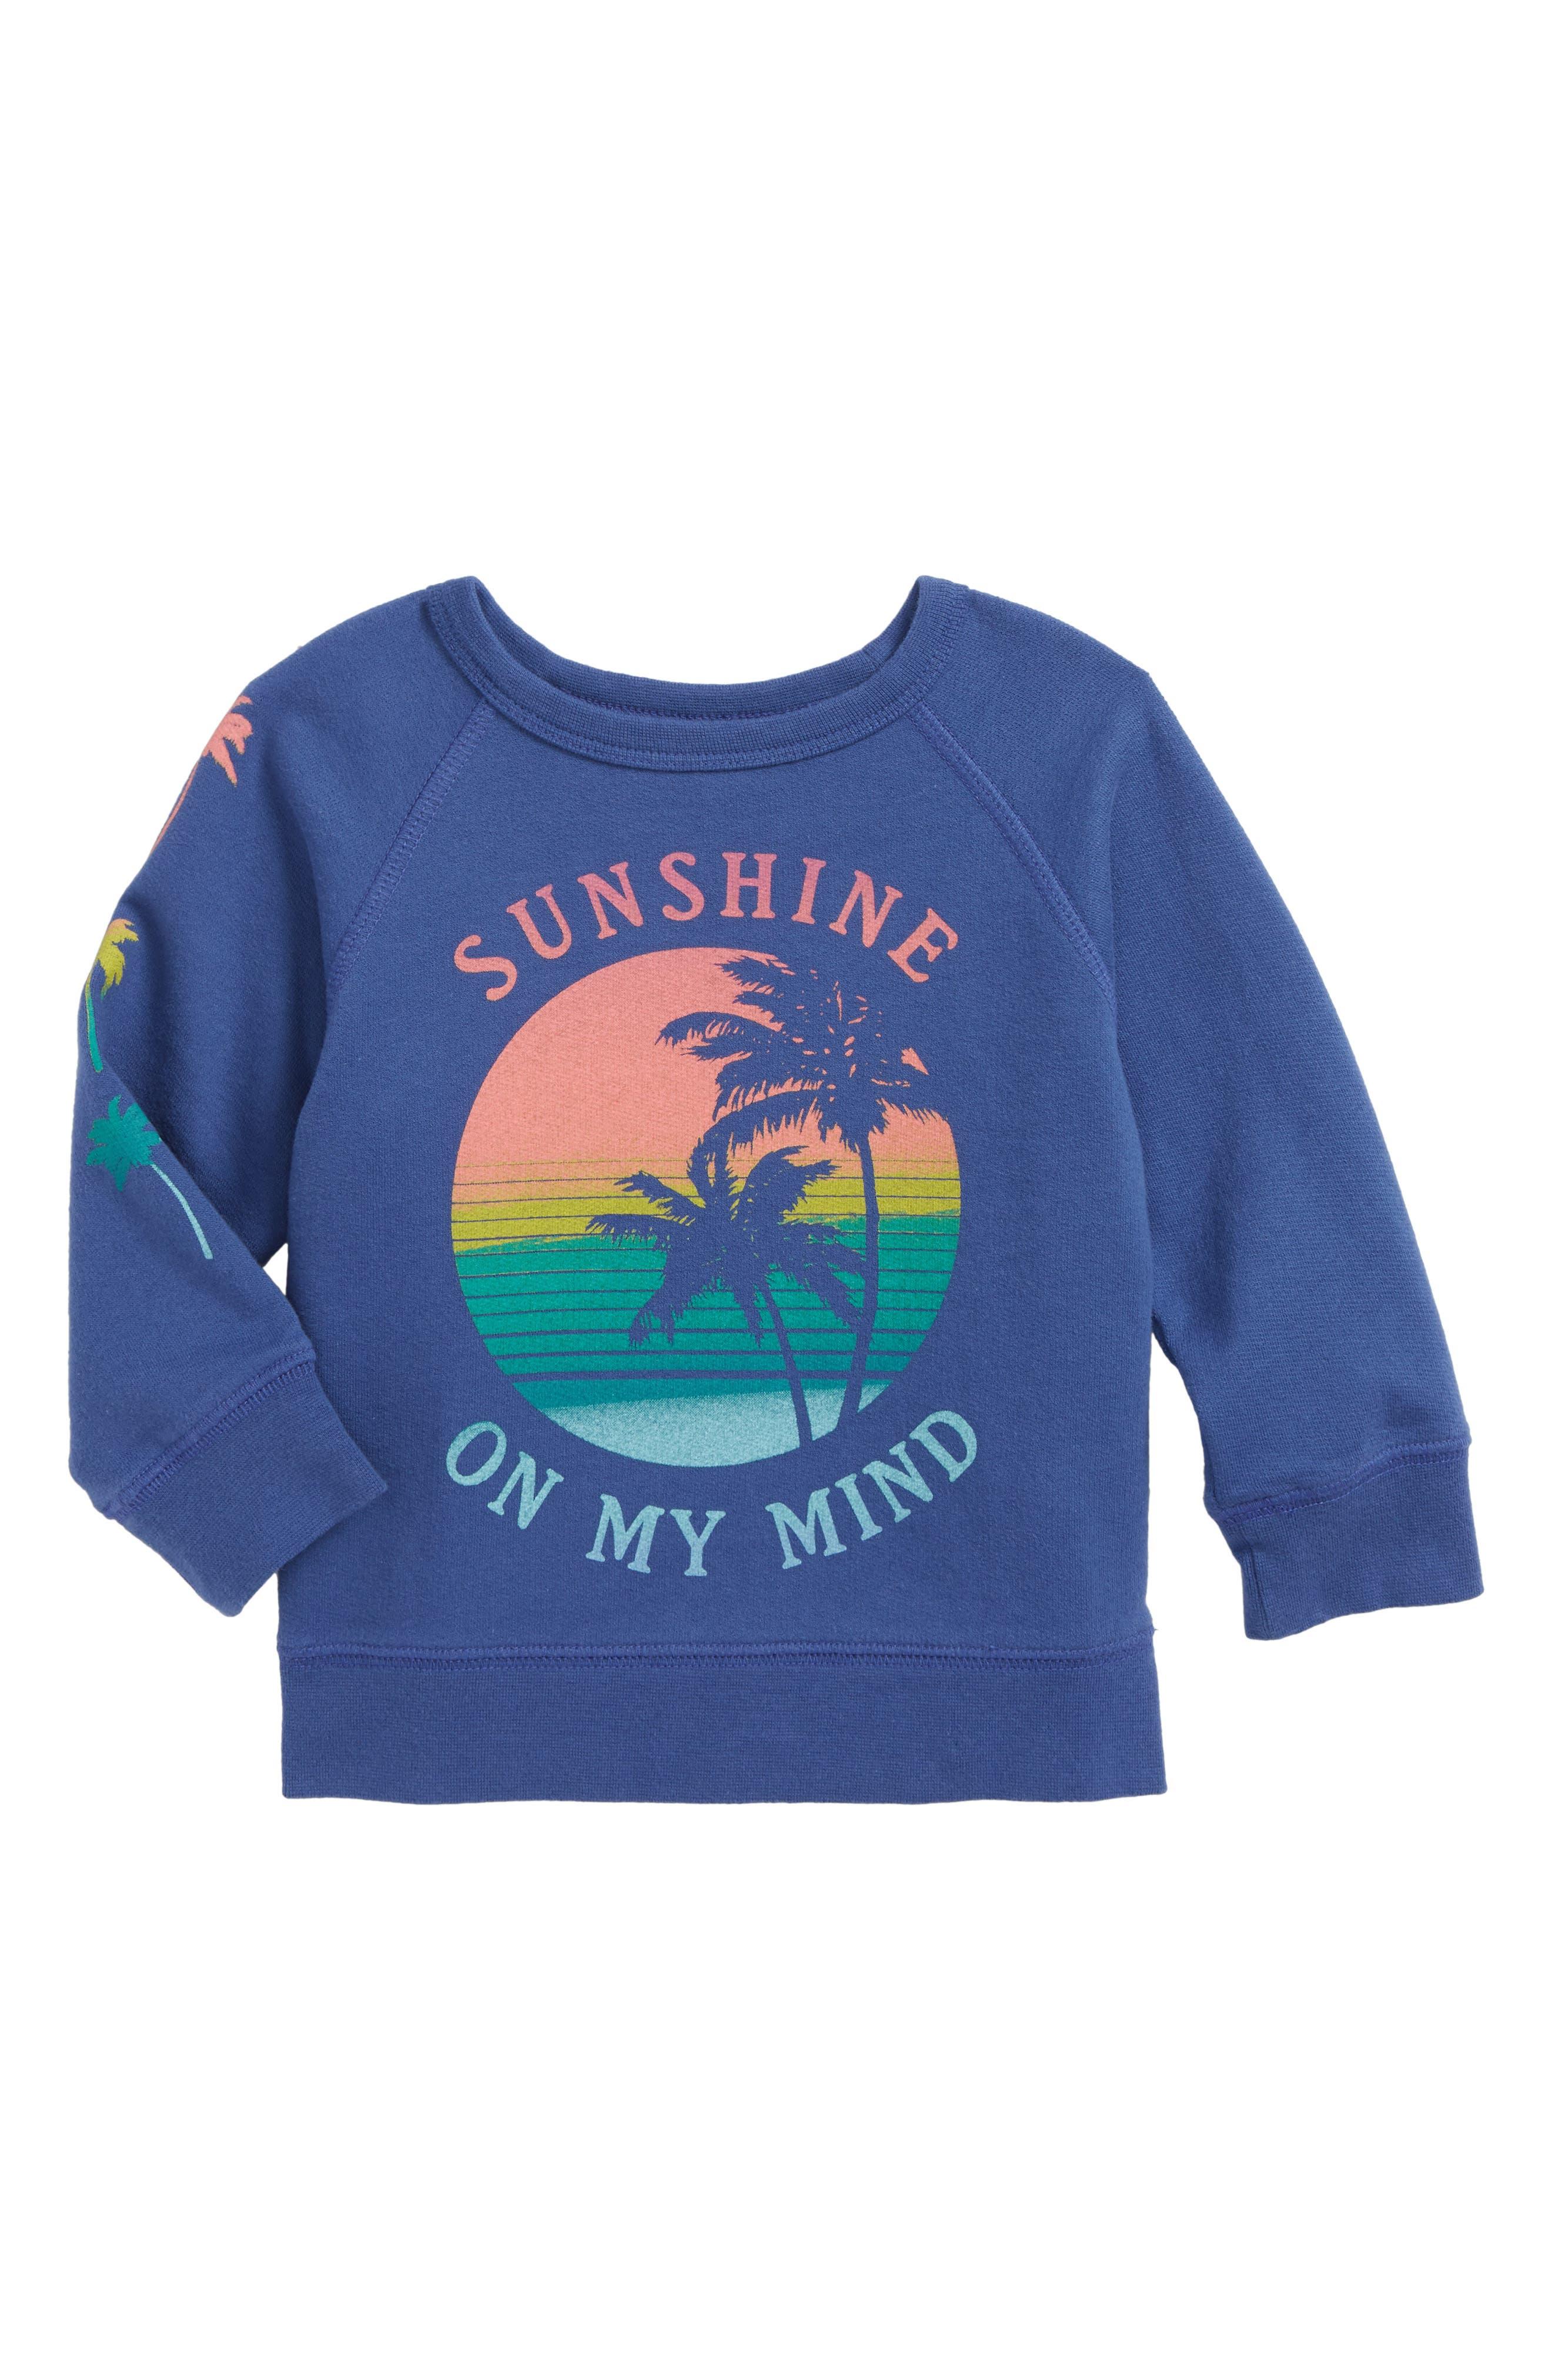 Sunshine On My Mind Graphic Tee,                         Main,                         color, 410